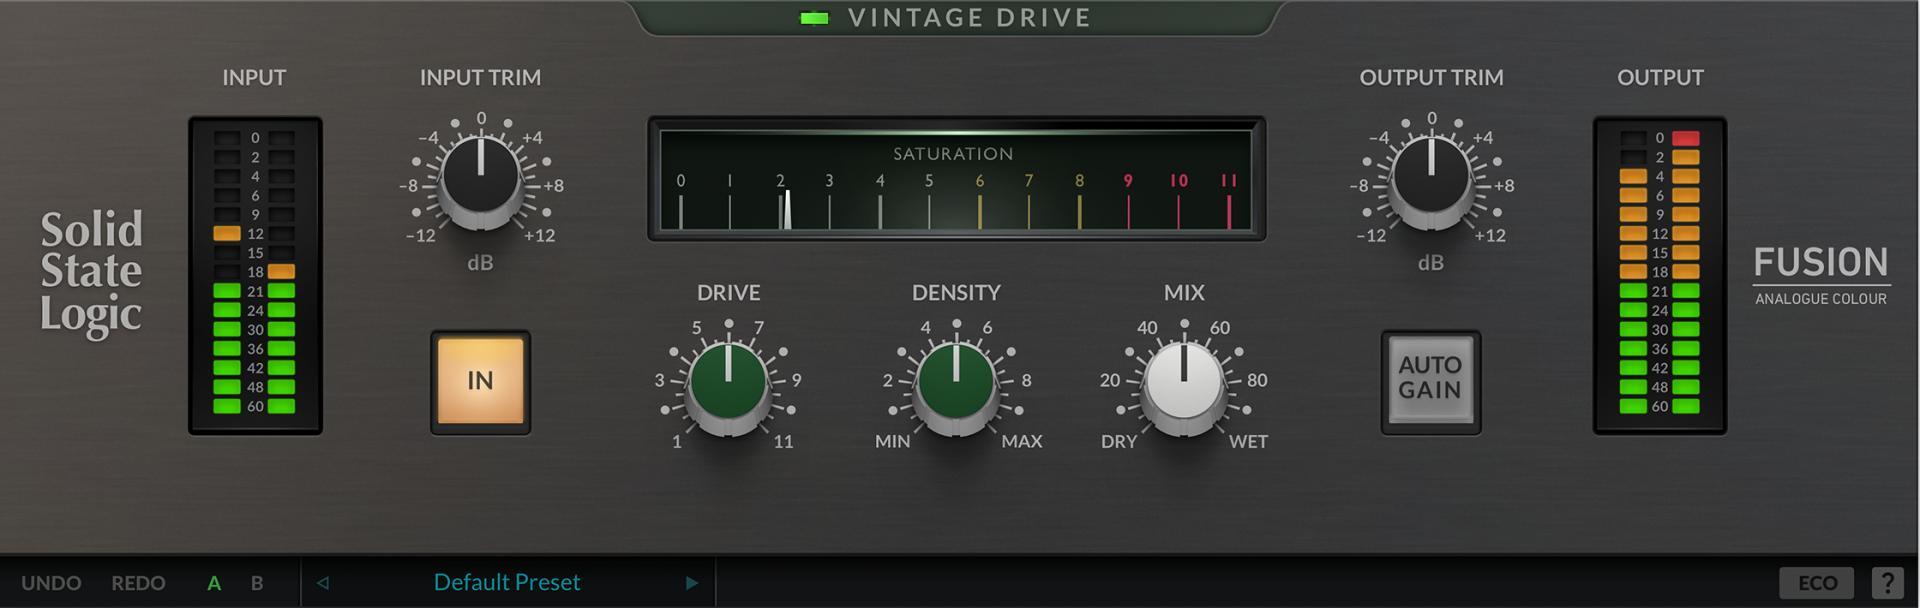 SSL Fusion Vintage Drive Plug-in thumb.png.jpg